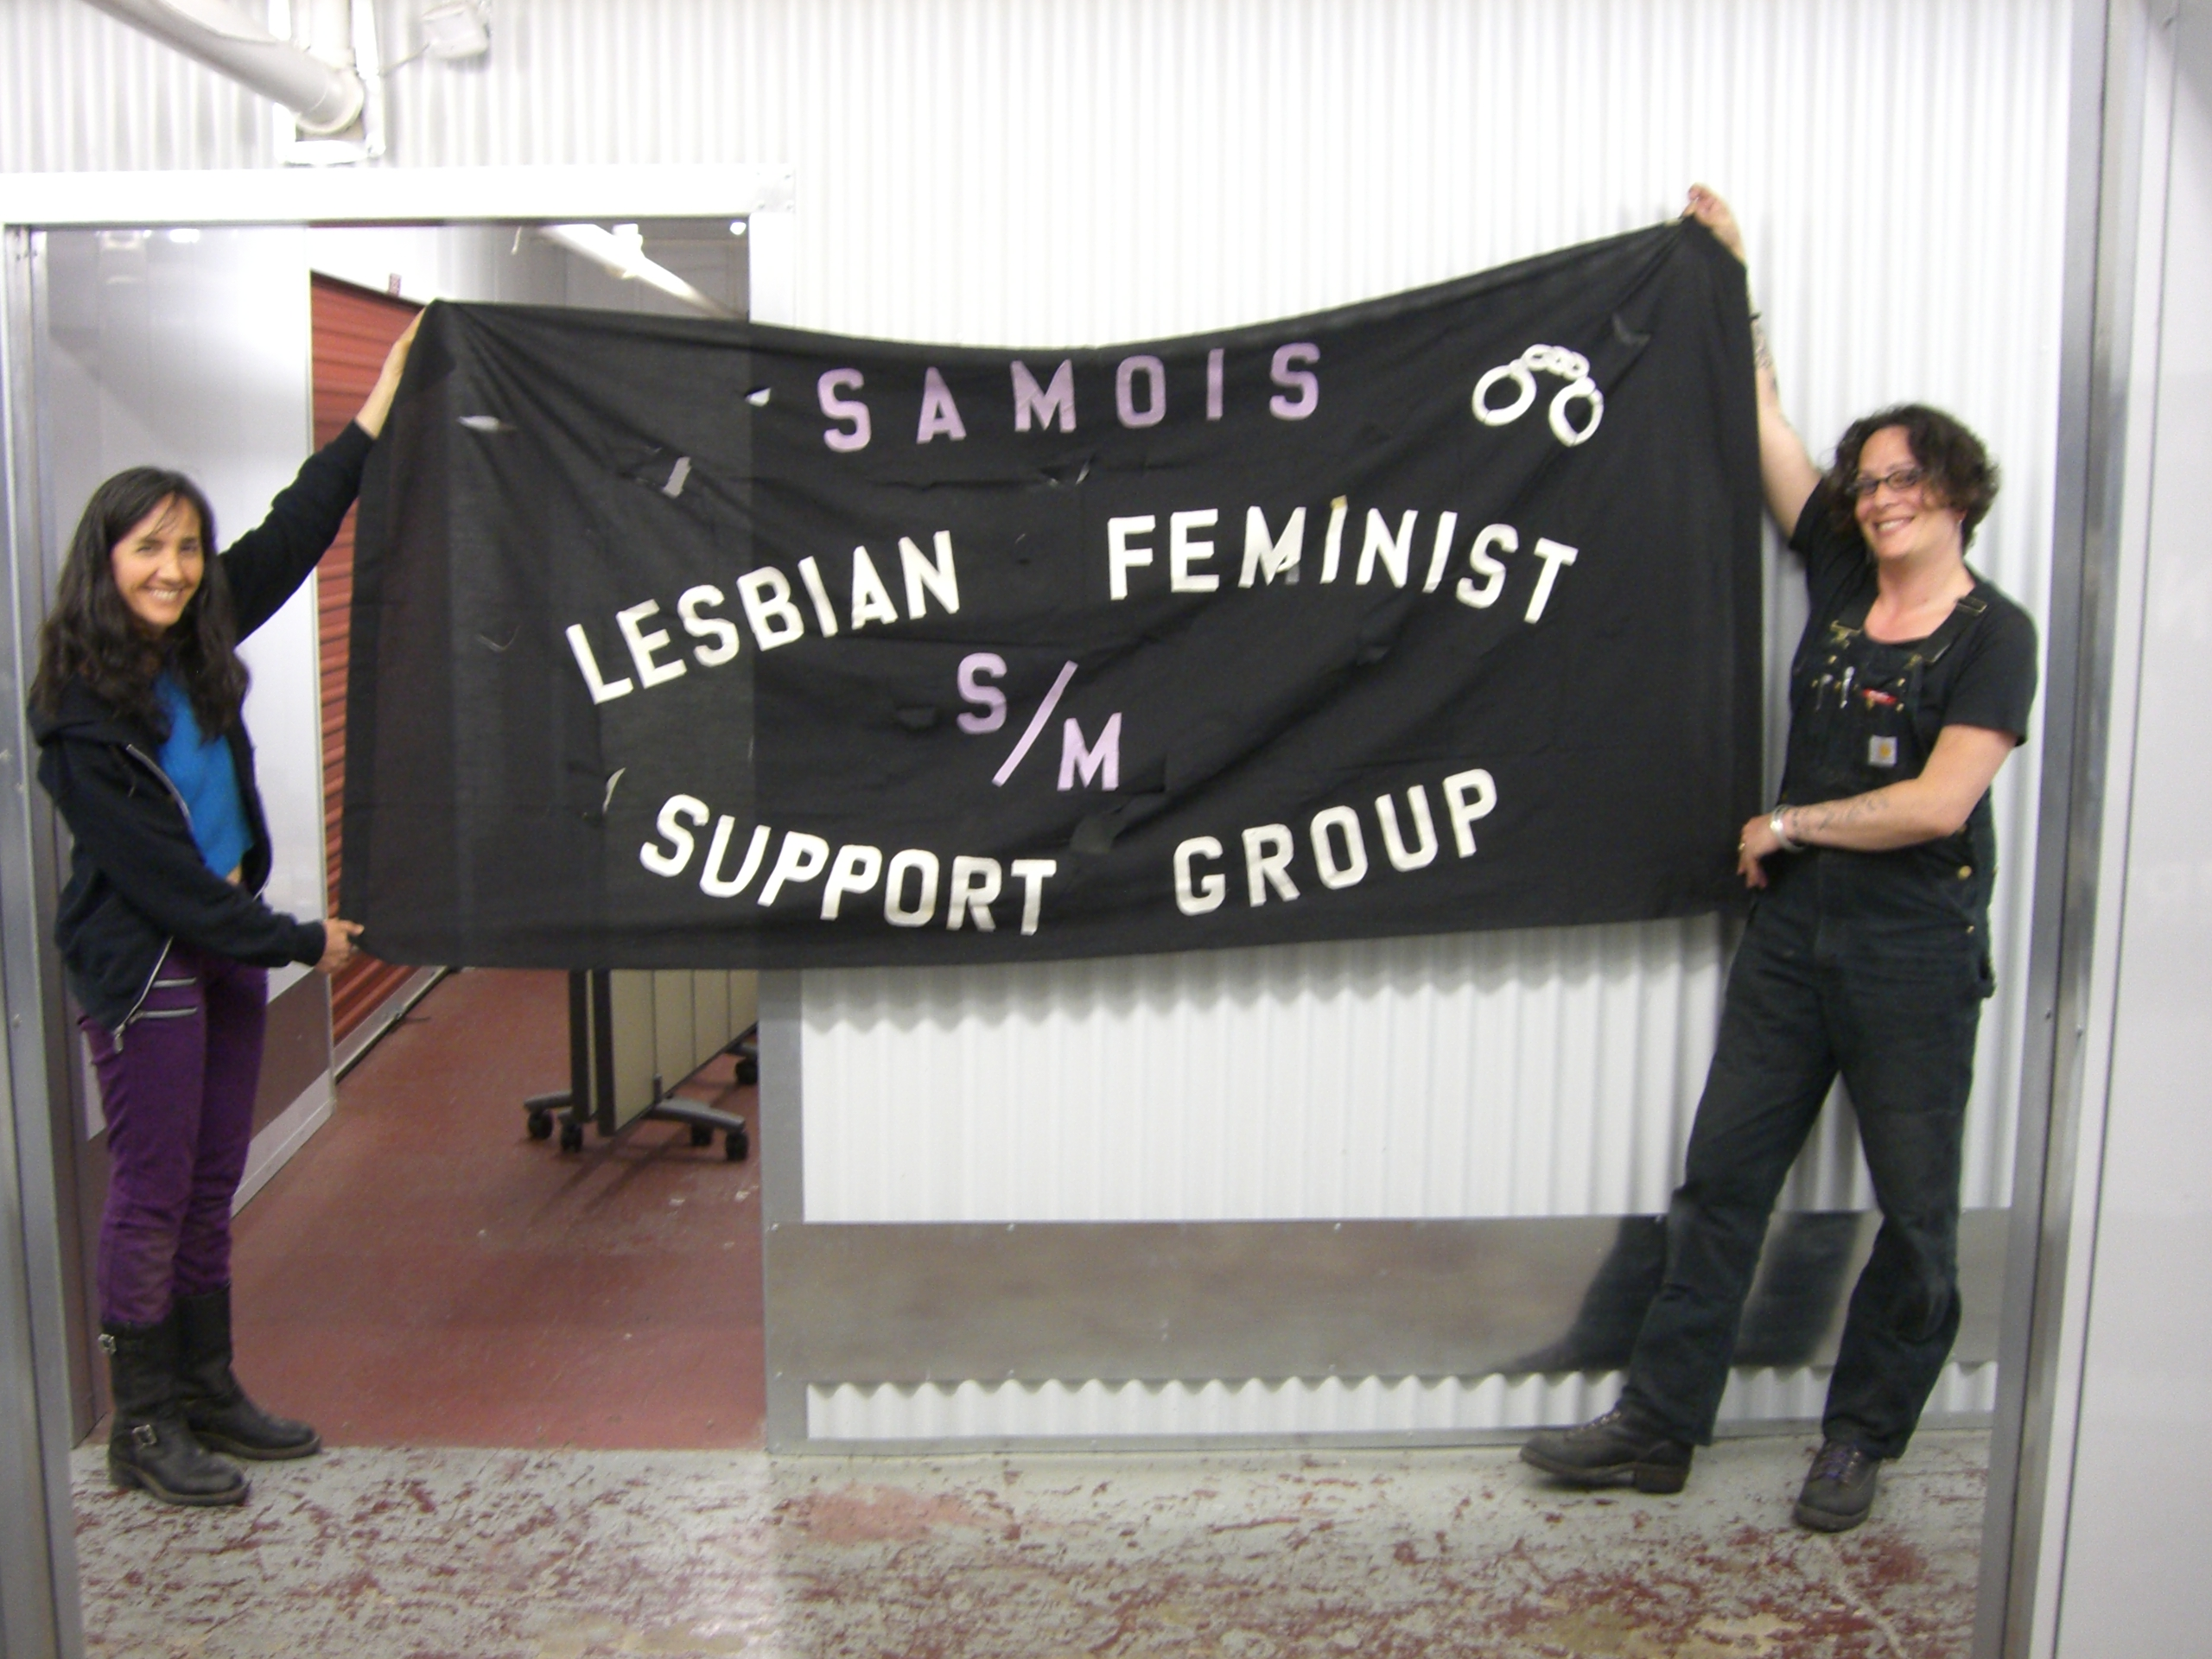 "Marlene Hoeber and Dorian Katz holding a parade banner that reads ""SAMOIS lesbian feminist s/m support group"""